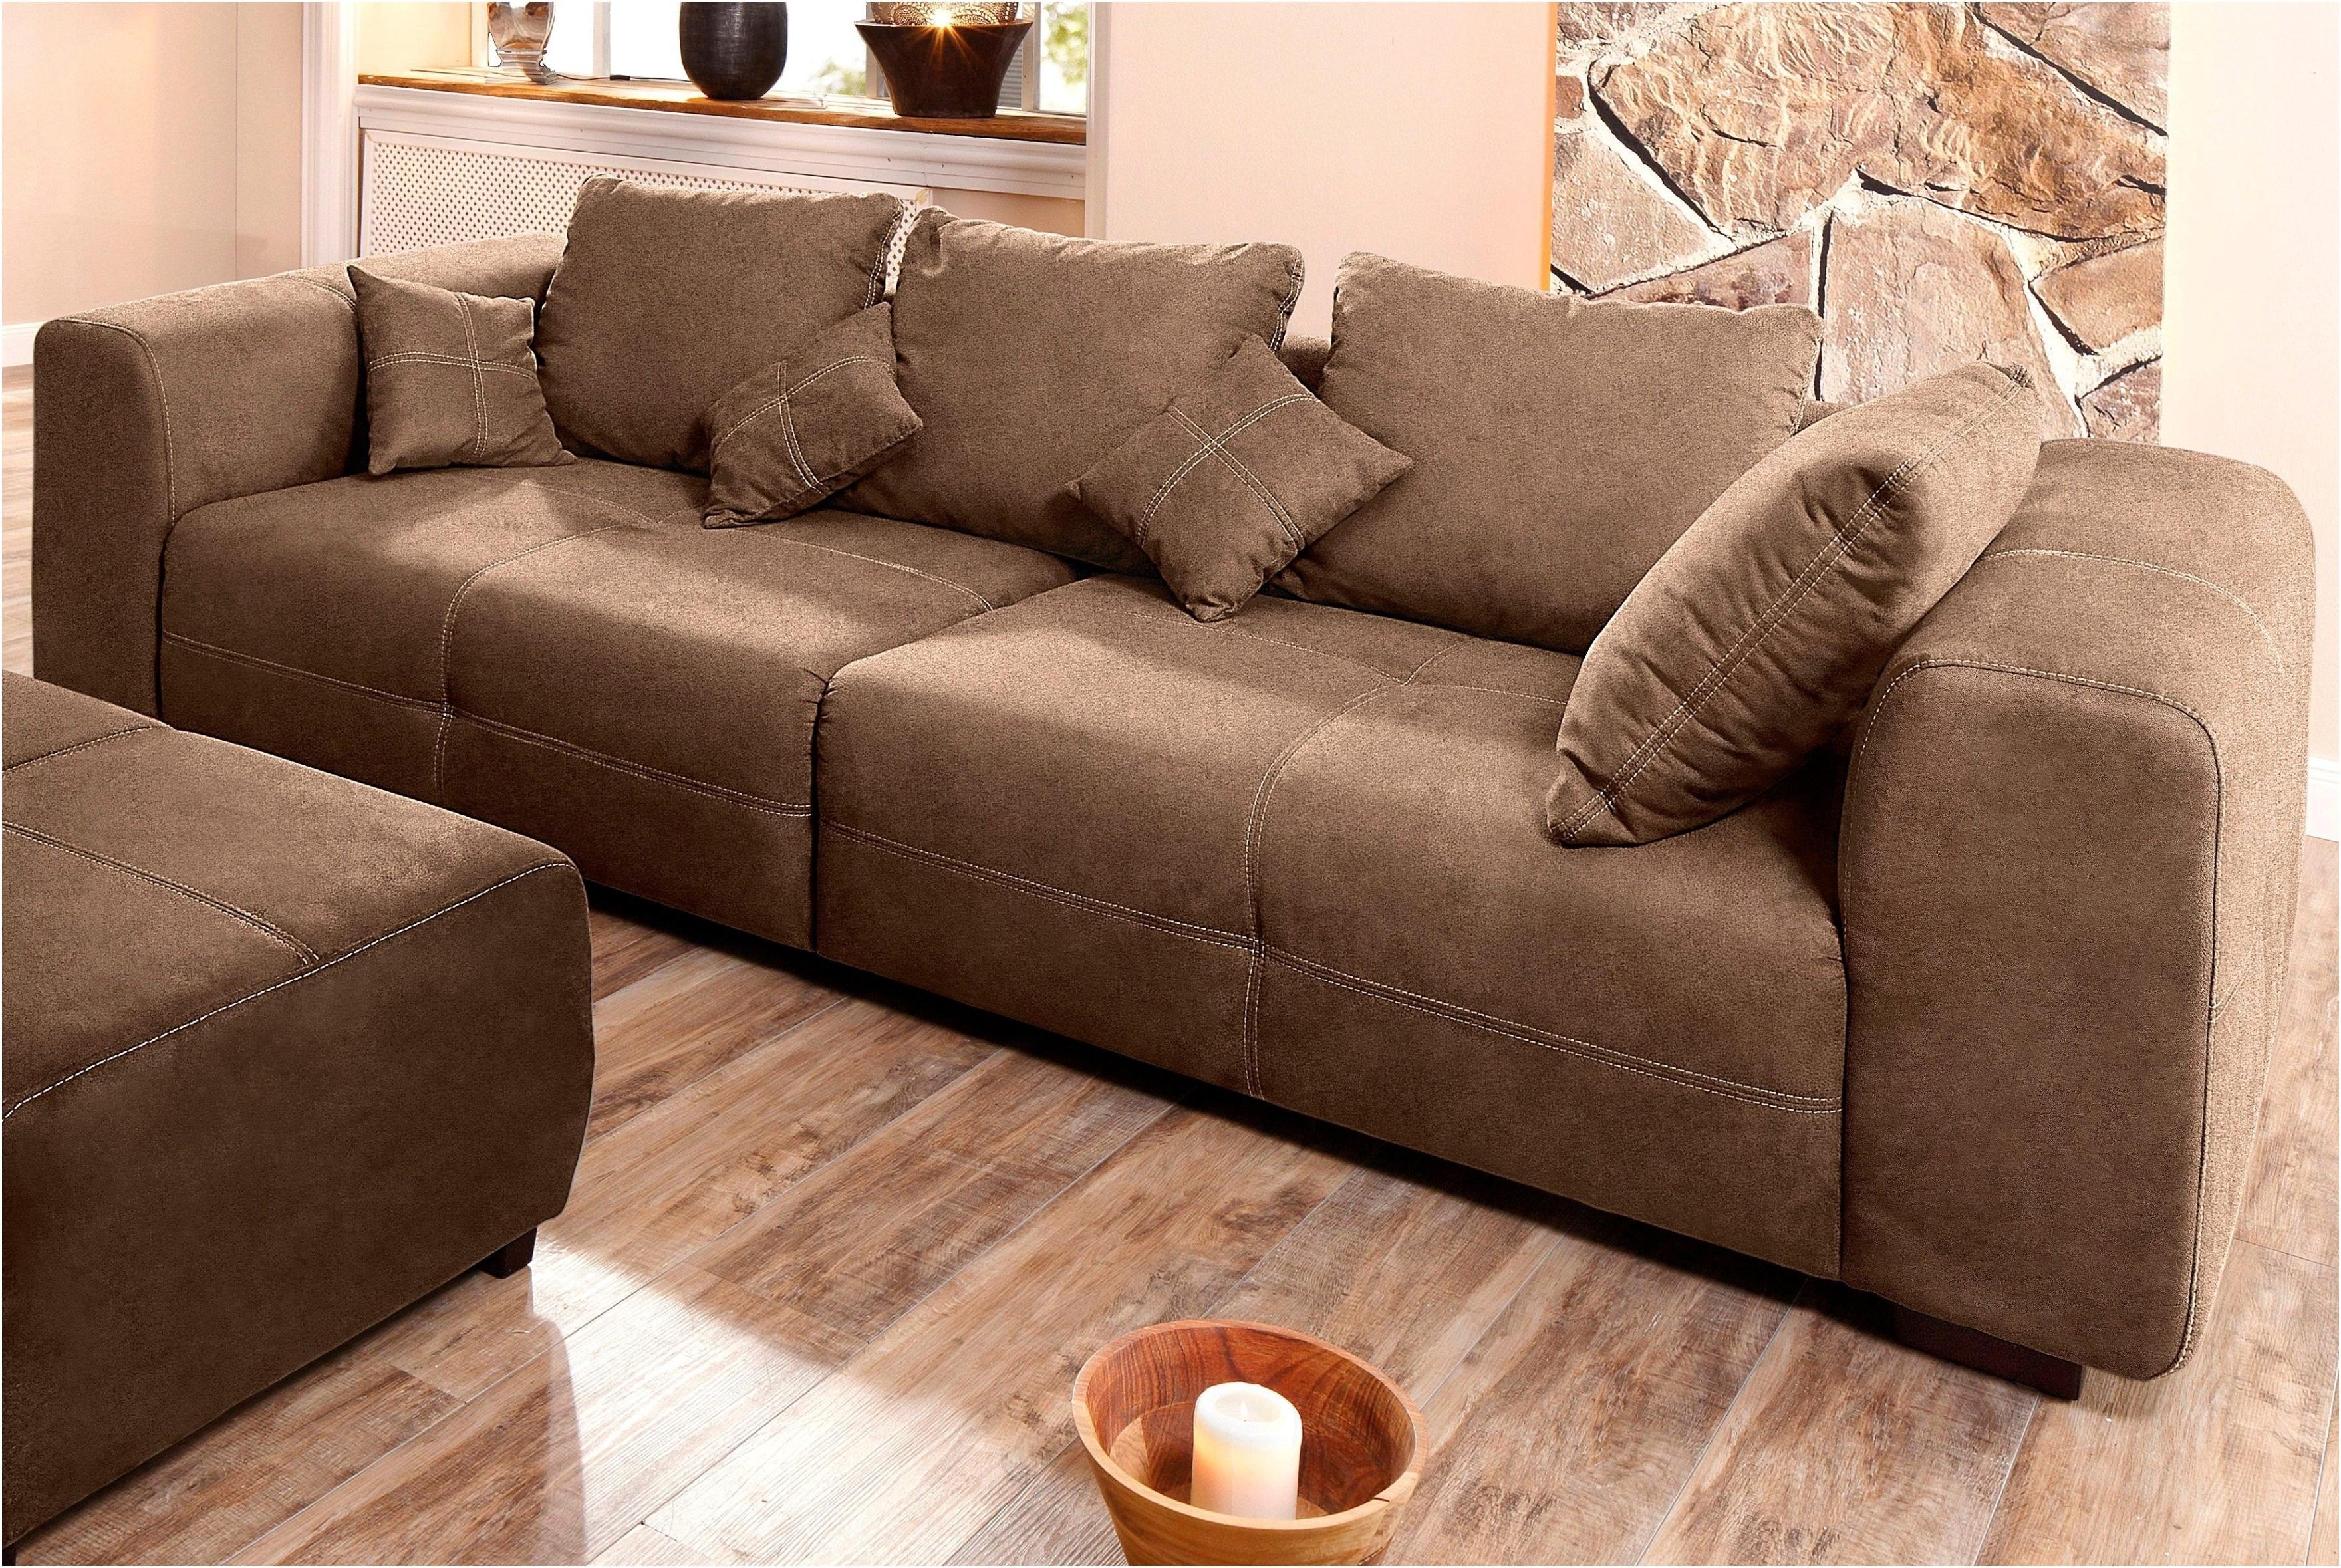 Sofa Reinigen  Natron Zum Putzen Simple X Crop Sofa Reinigen Sidebar